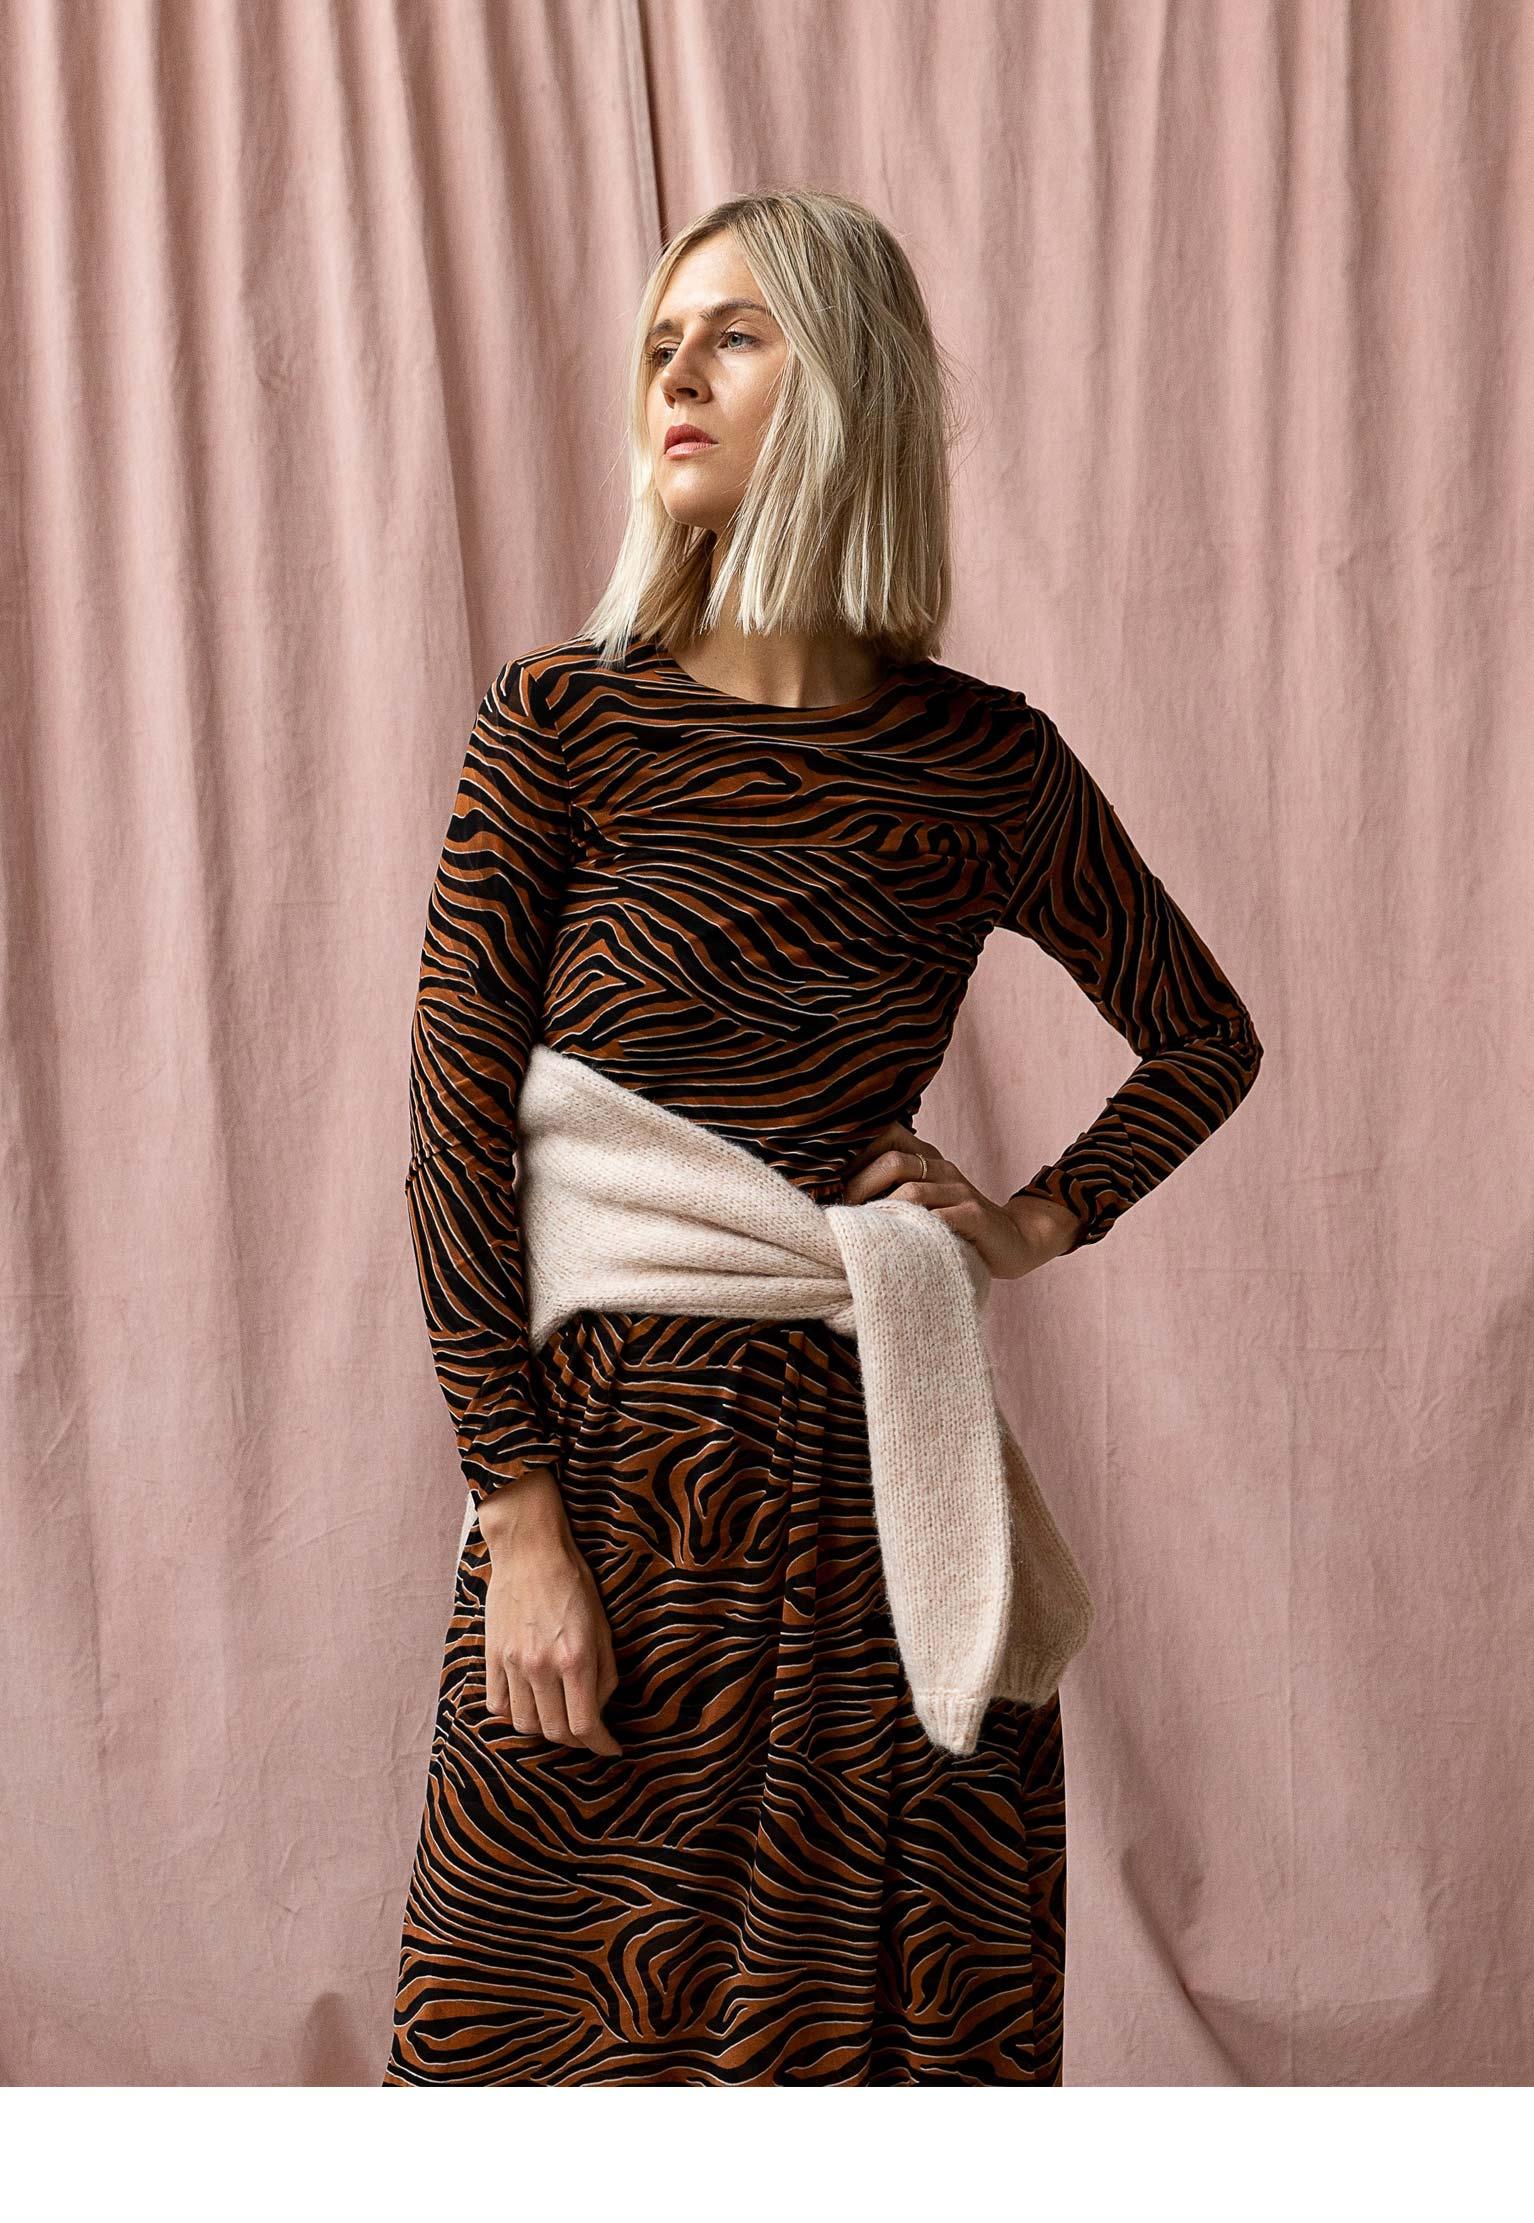 M Linda Tol Women's fashion